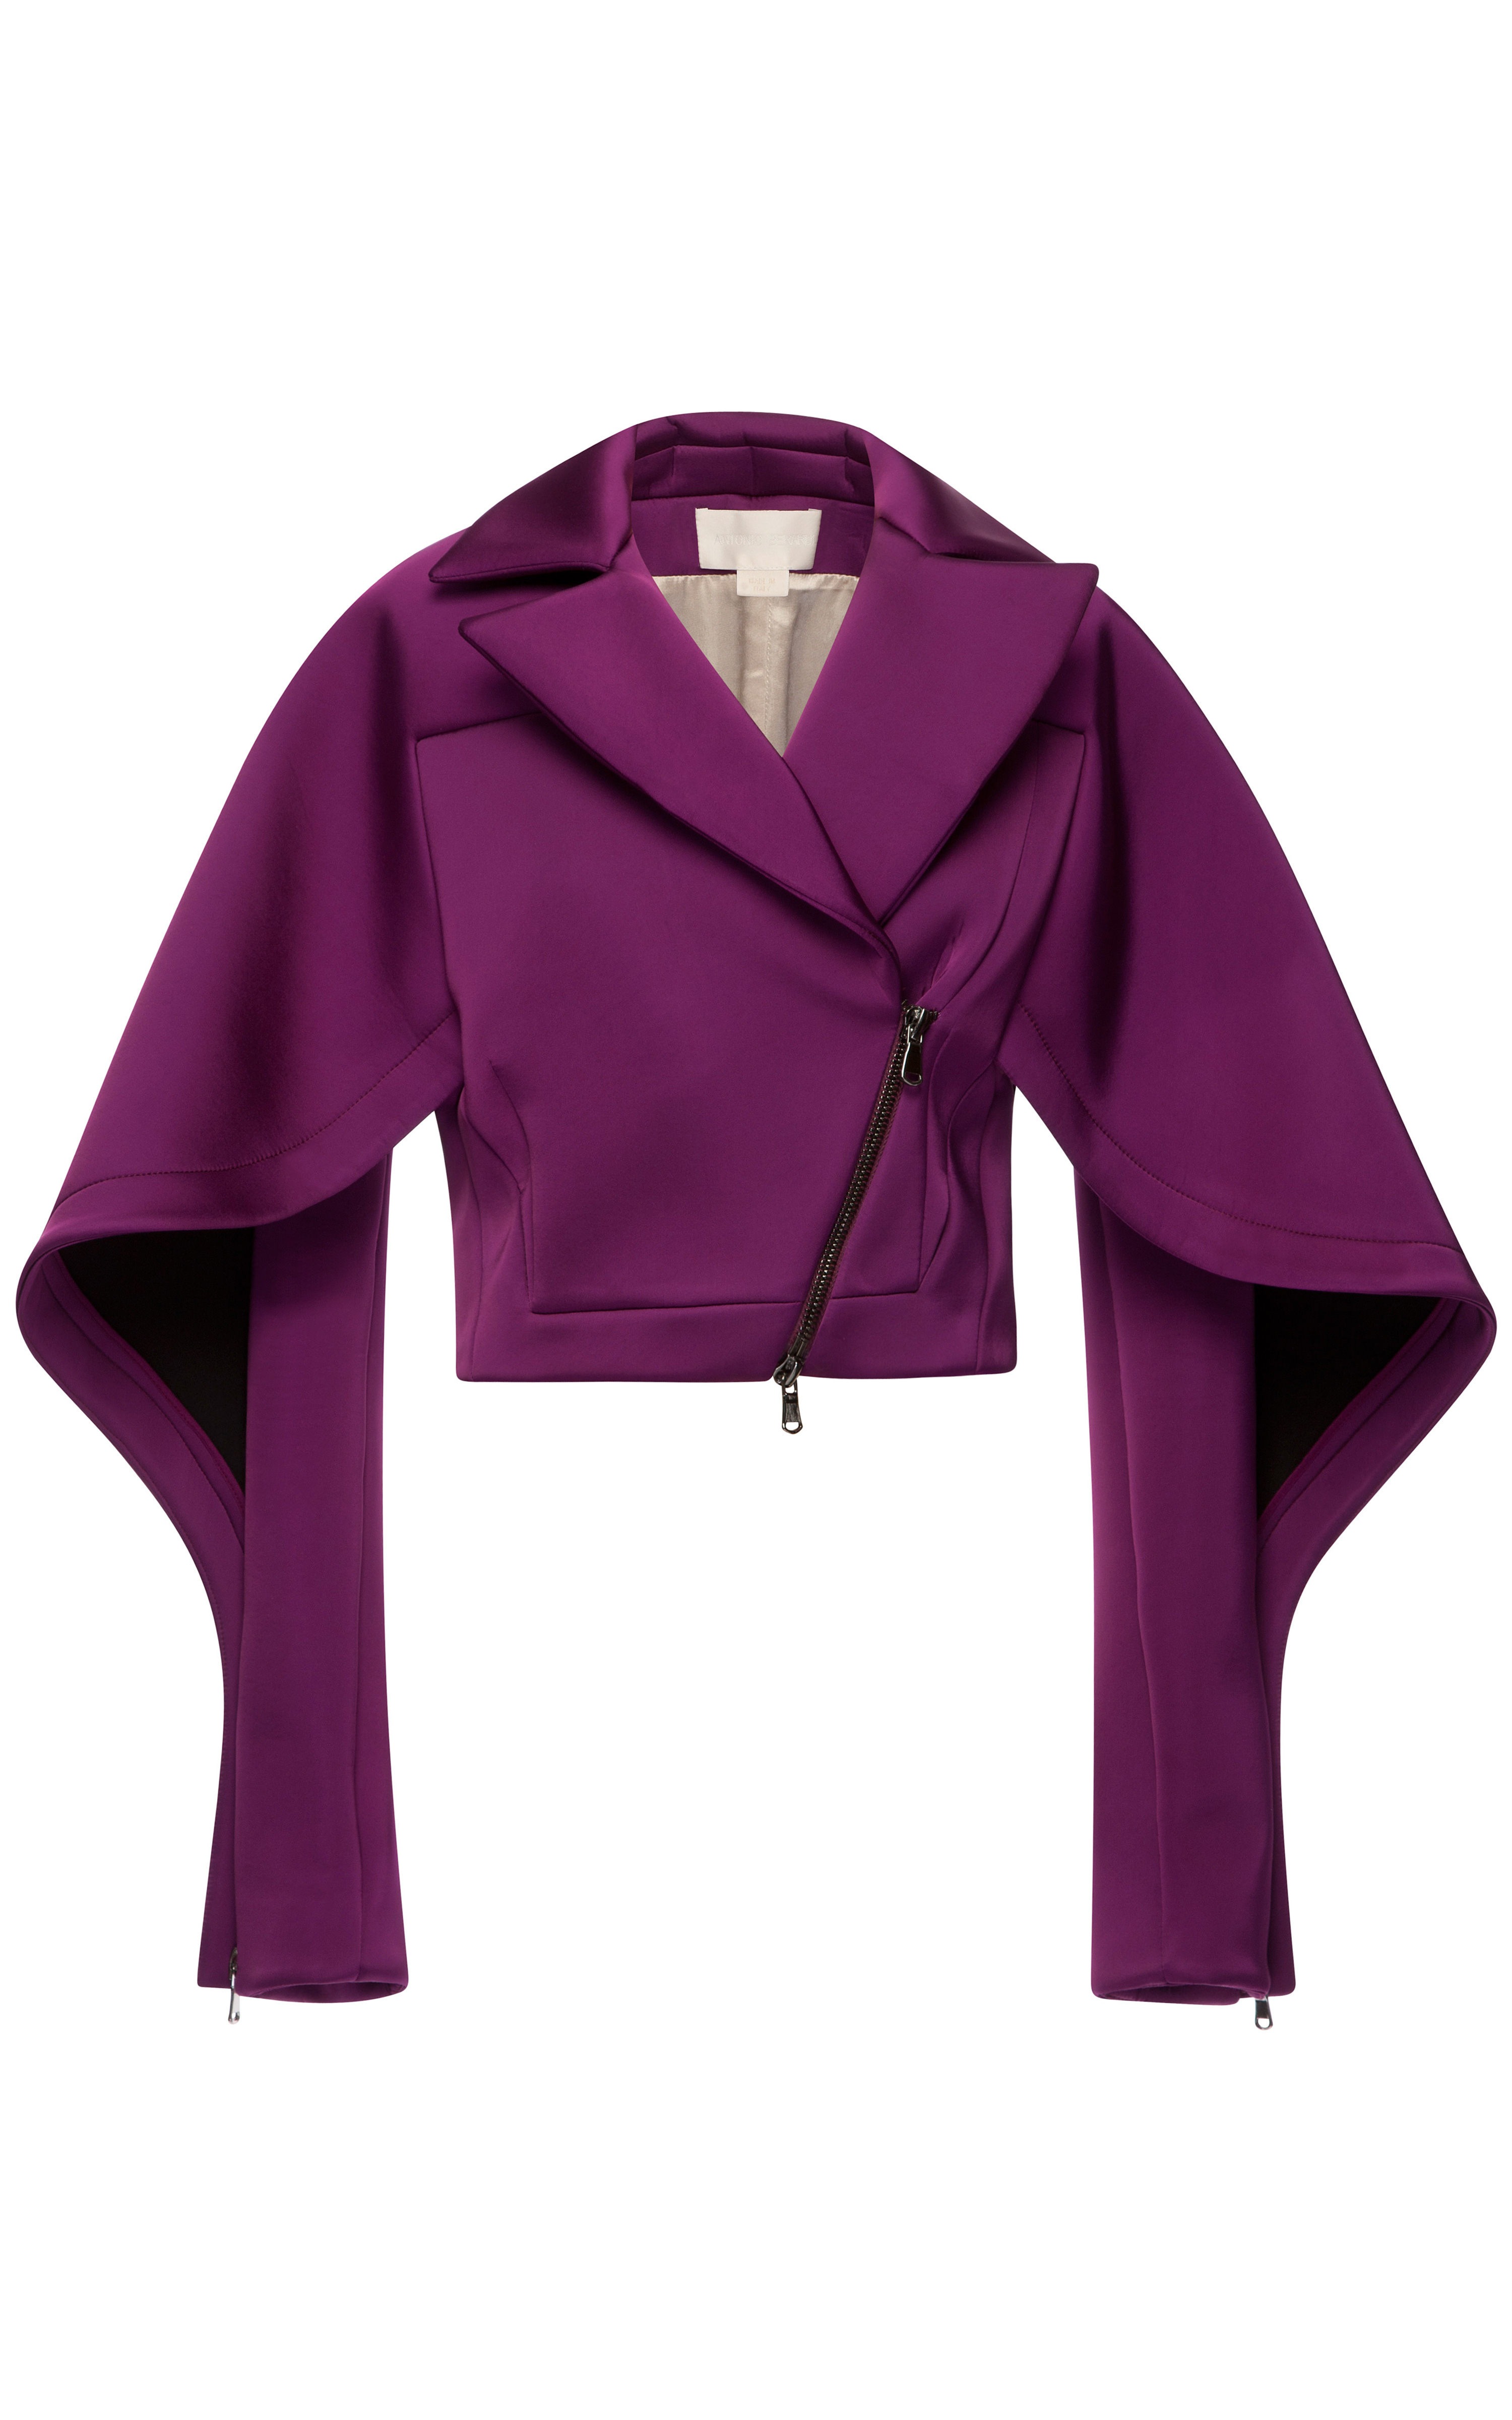 Raspberry silk scuba short jacket by antonio berardi